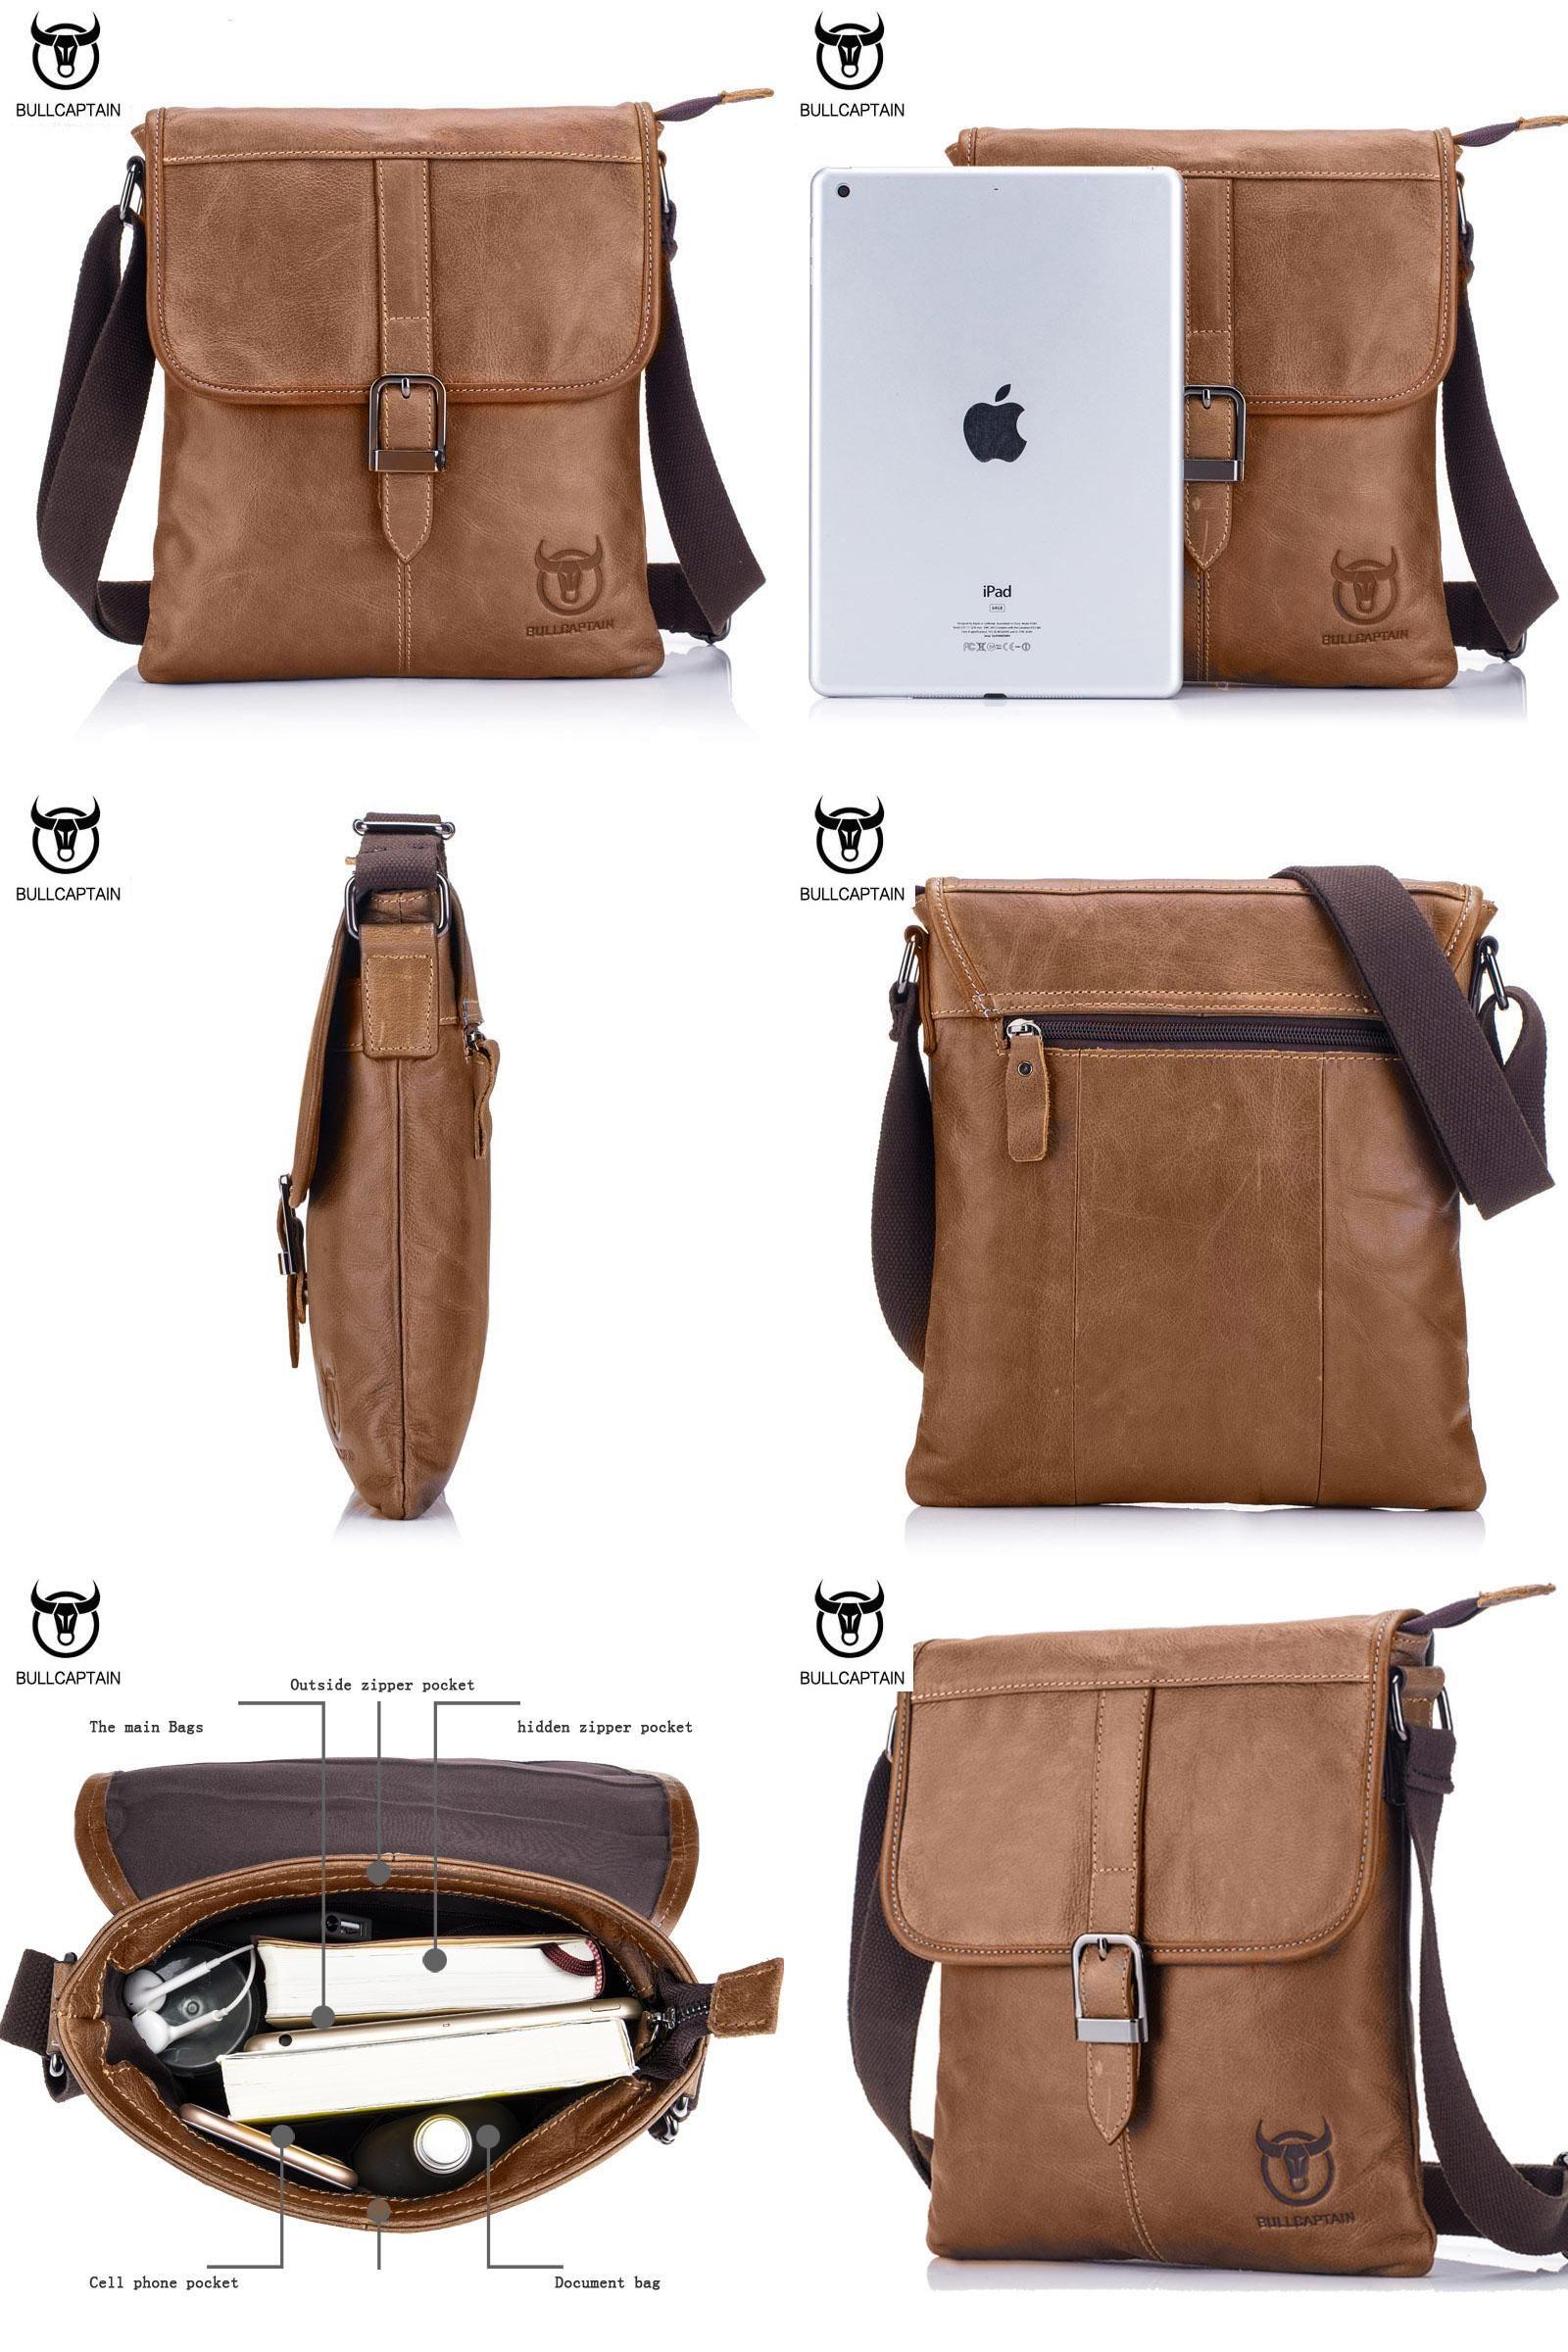 85cb137f7e29  Visit to Buy  BULL CAPTAIN 2017 Vintage Bag Genuine Leather Man Piping  Design Crossbody